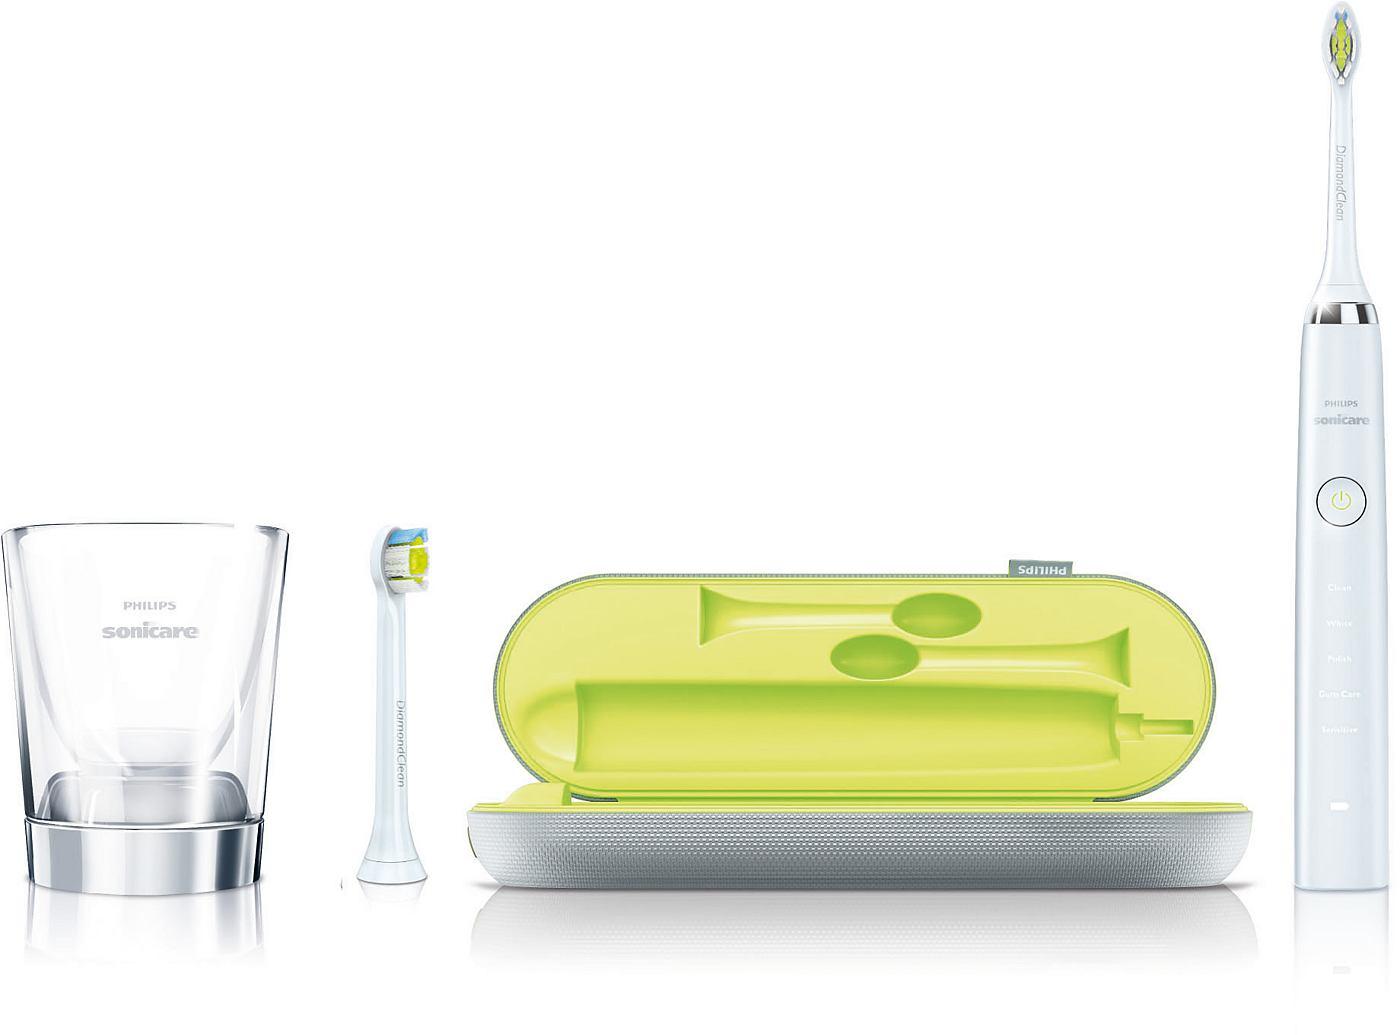 Philips Sonicare Diamond HX9332/04 Elektrische tandenborstel